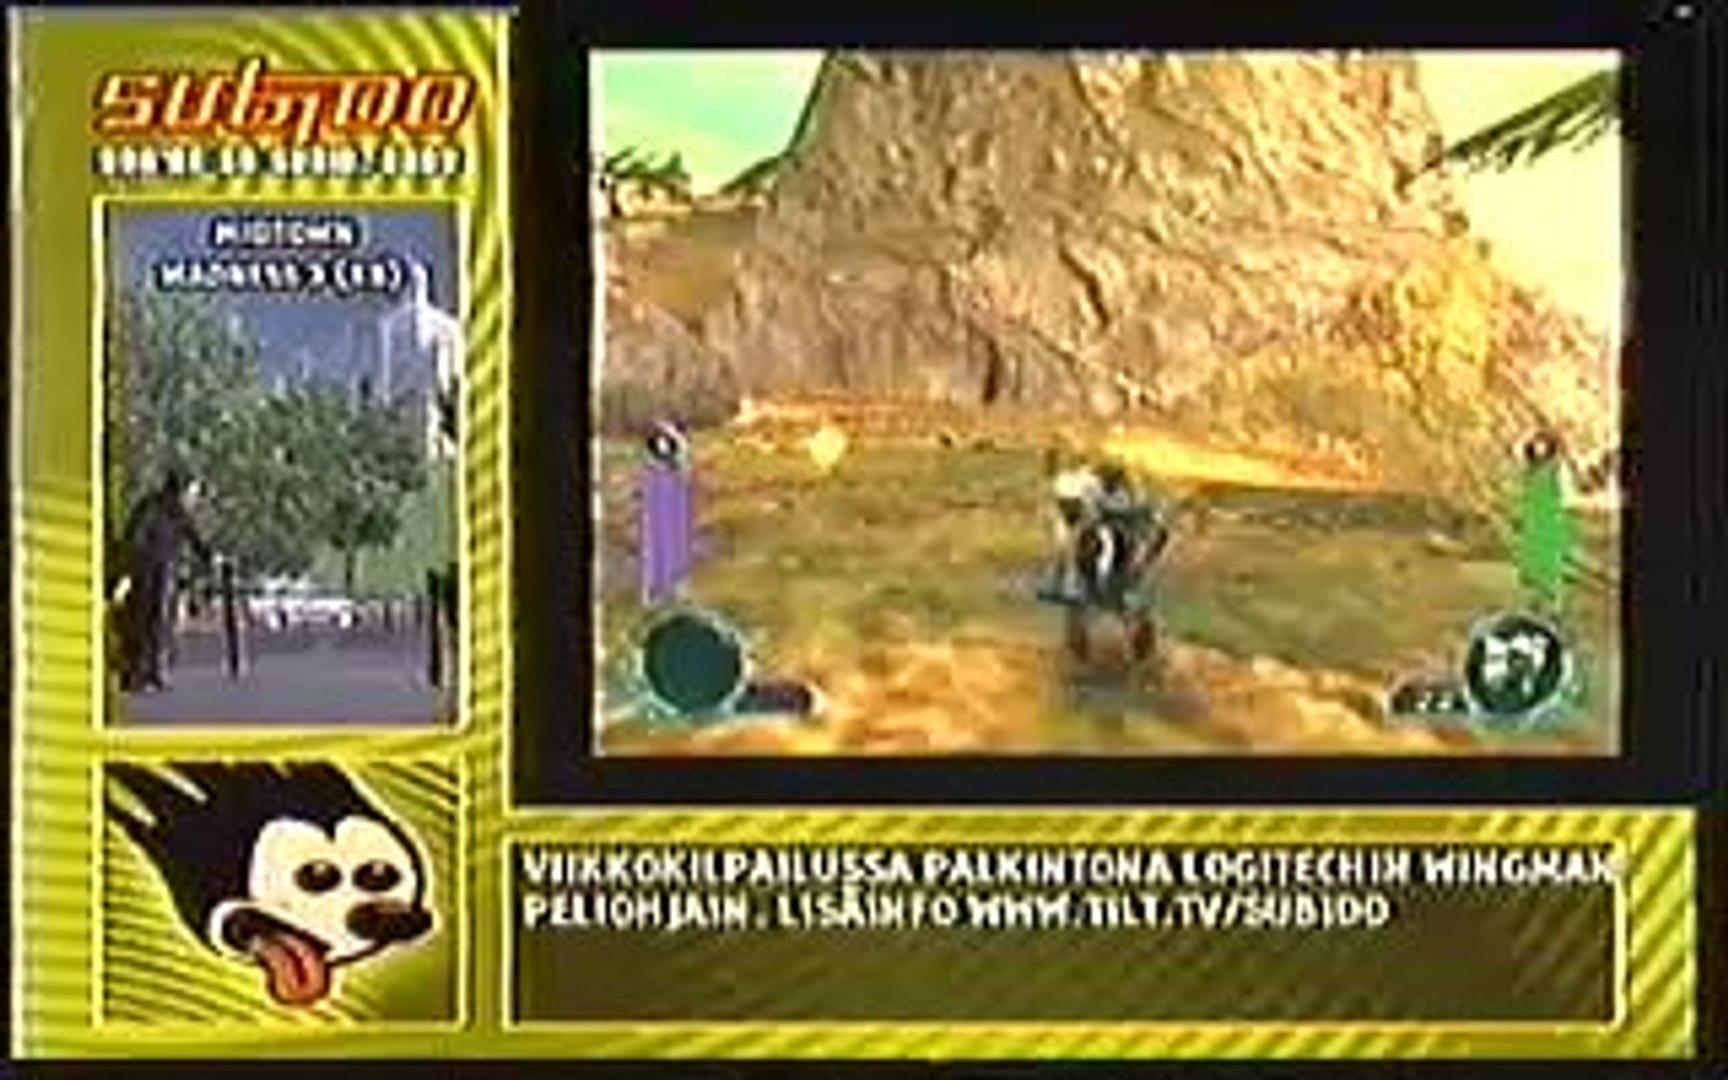 Subido 'Giants Citizens of Kabuto tilt.tv Subtv